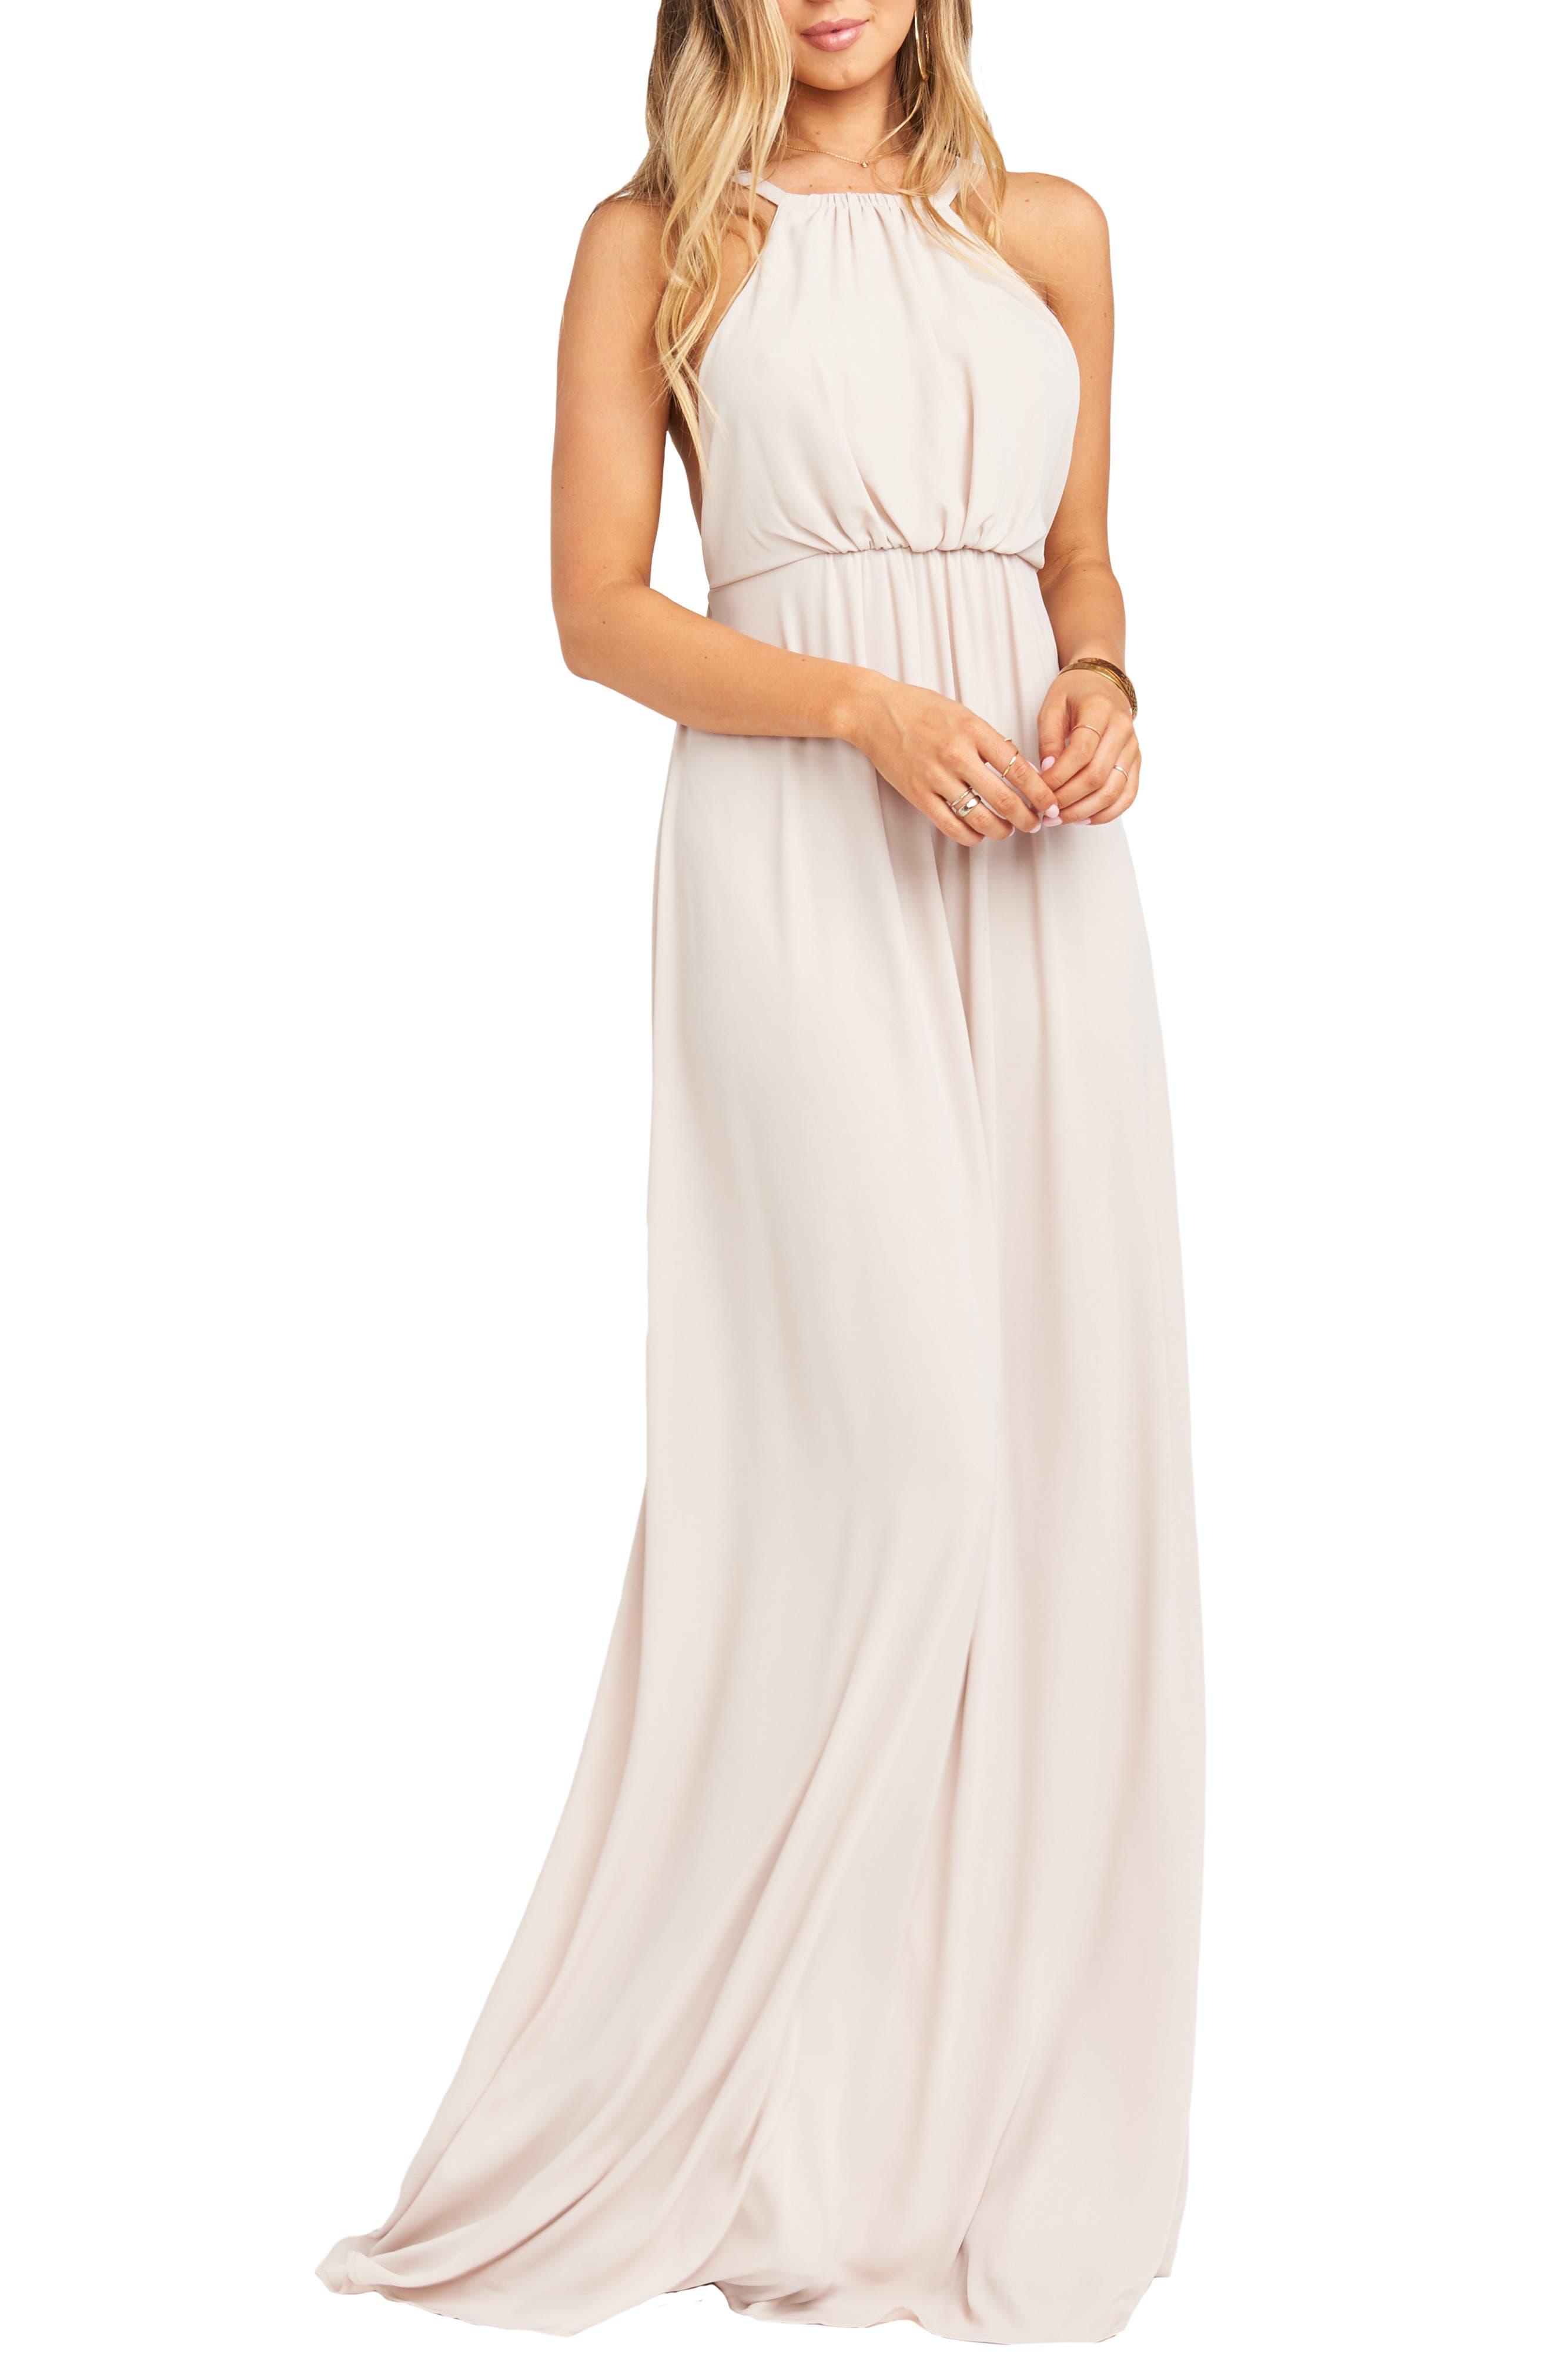 60s Wedding Dresses | 70s Wedding Dresses Womens Show Me Your Mumu Amanda Maxi Dress Size Medium - Beige $178.00 AT vintagedancer.com